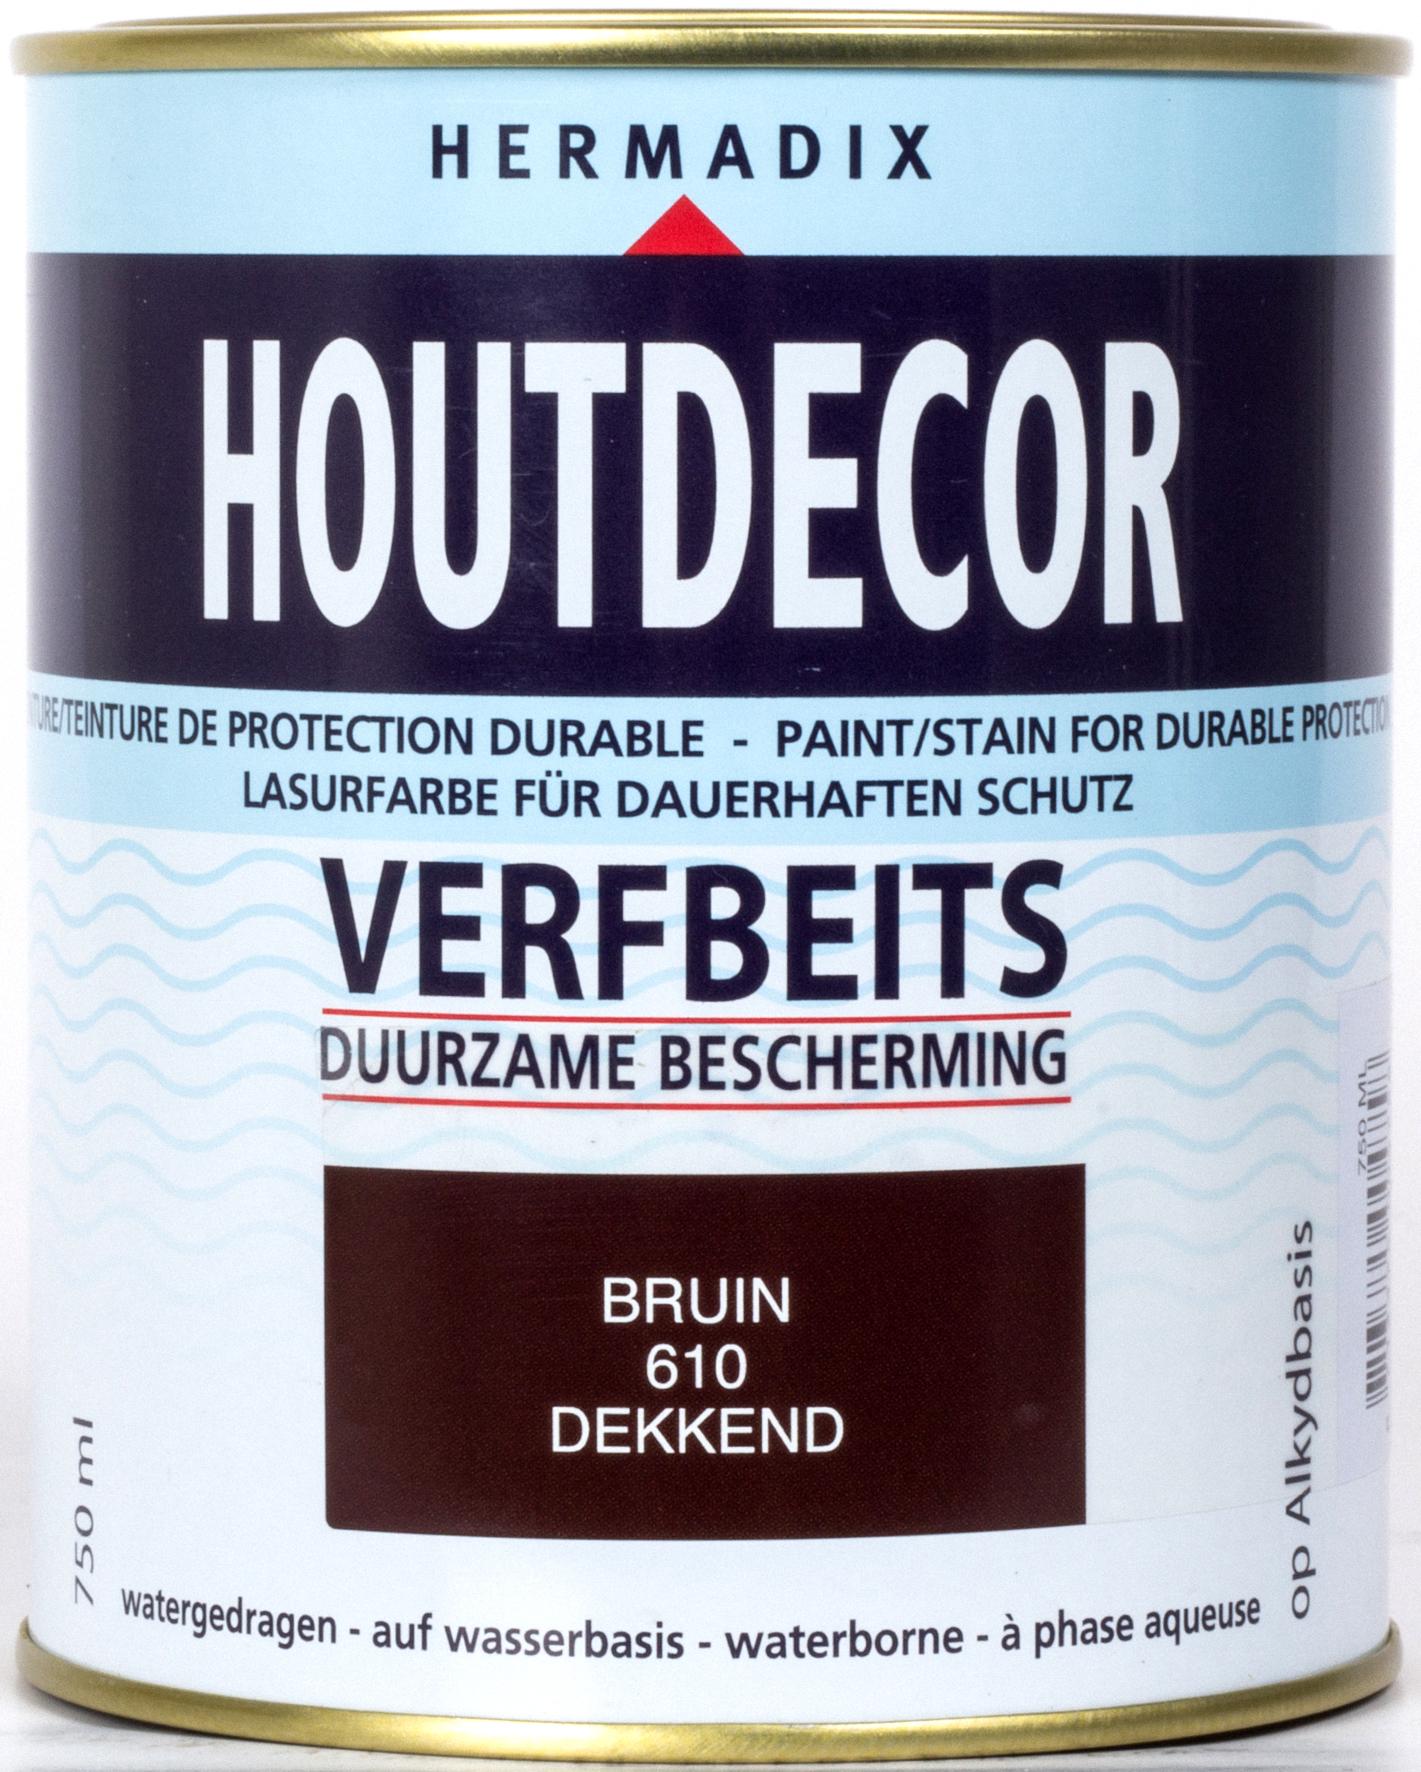 Hermadix | Houtdecor 610 Bruin | 750 ml